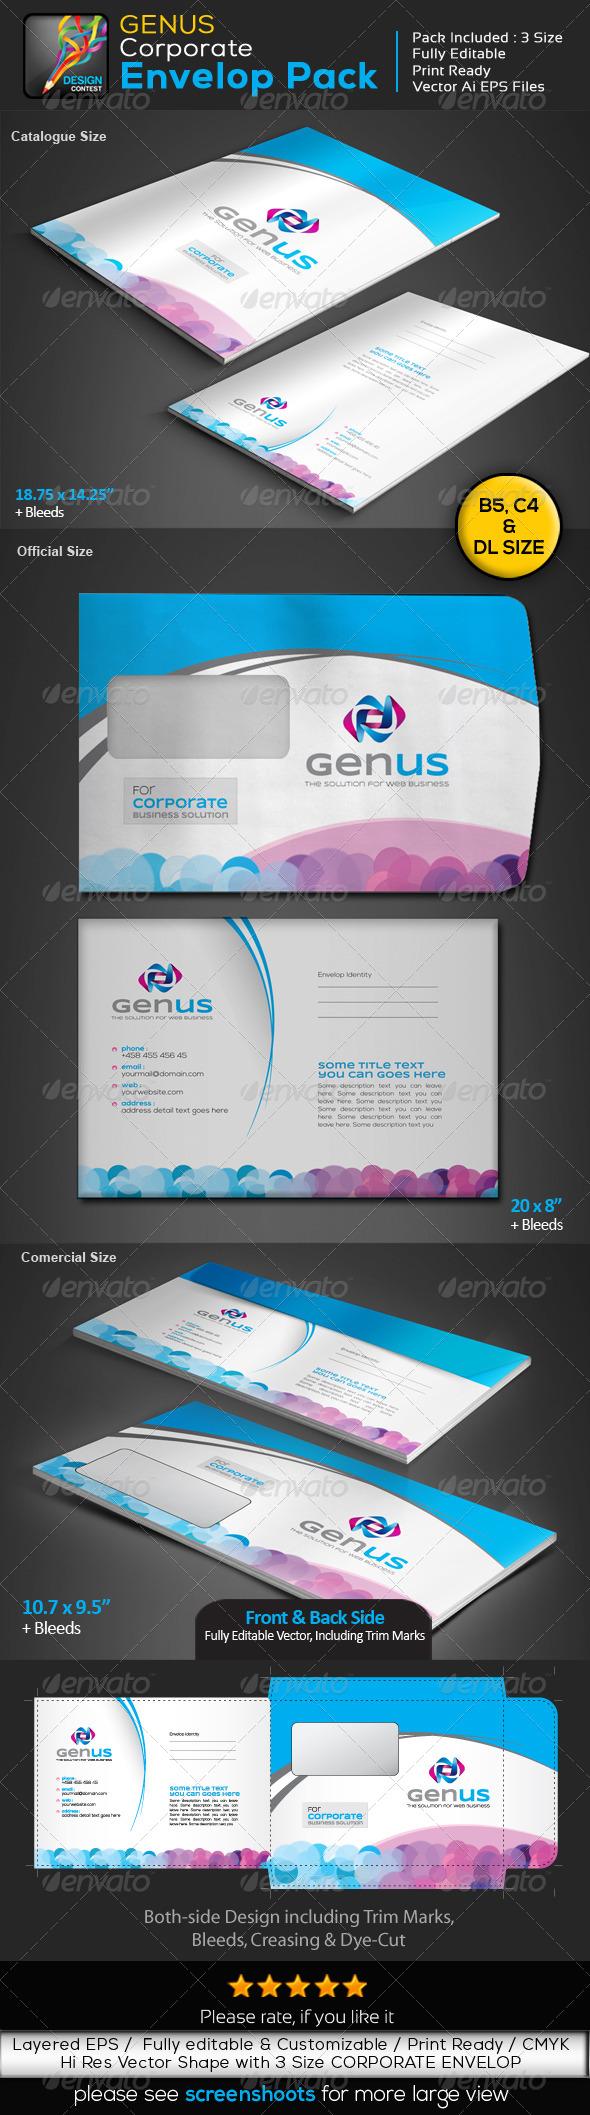 GraphicRiver GENUS Corporate Clean Creative Envelop Pack 5902310